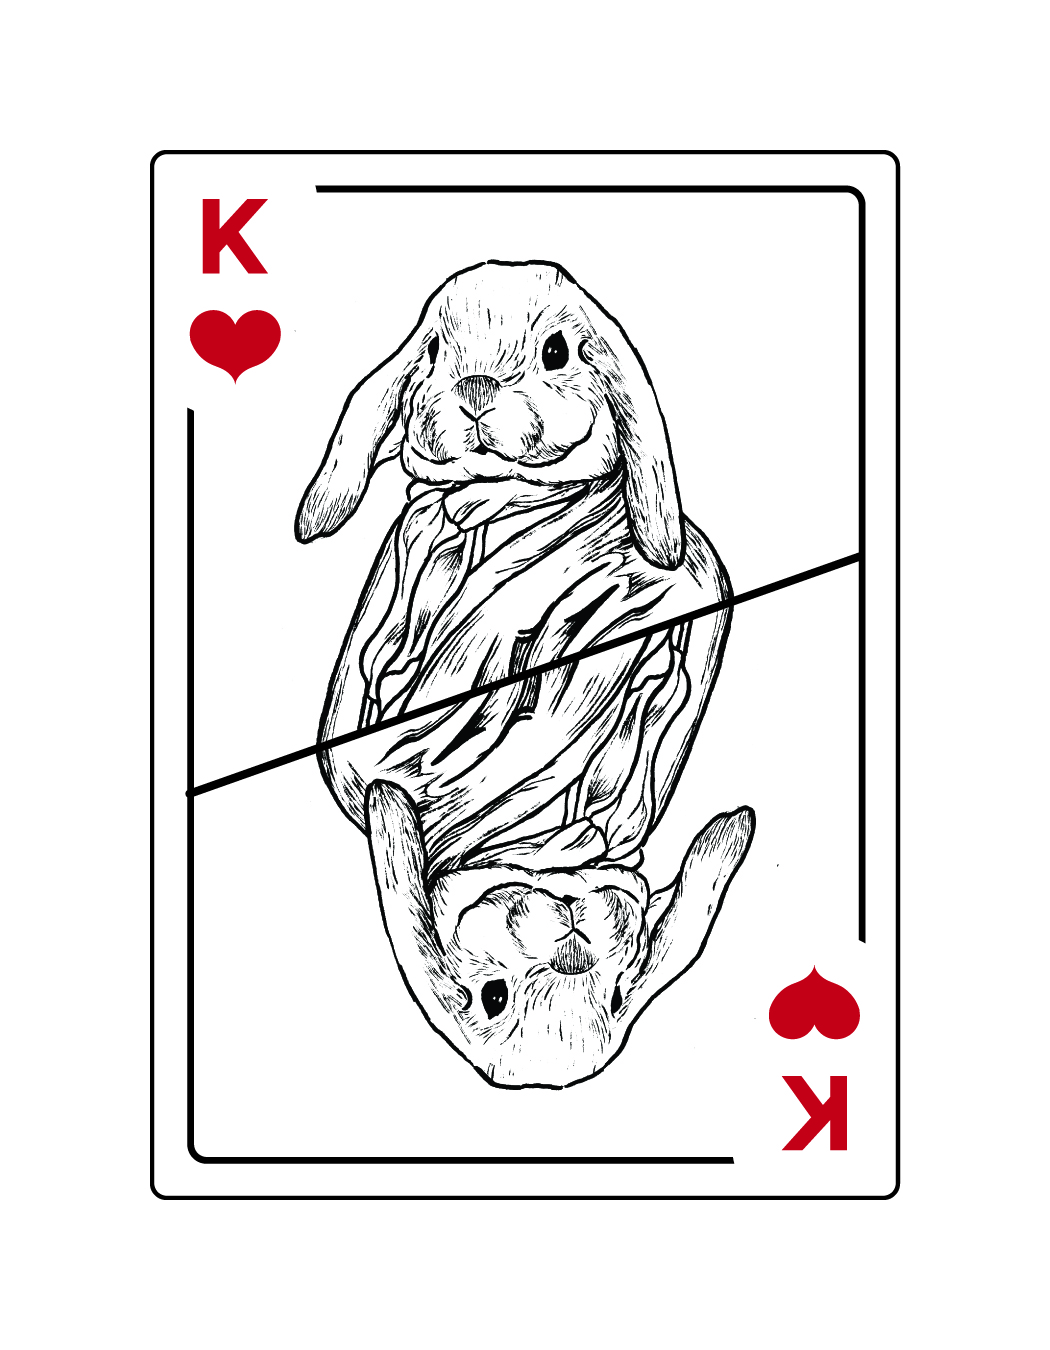 card_draft_1-27.jpg